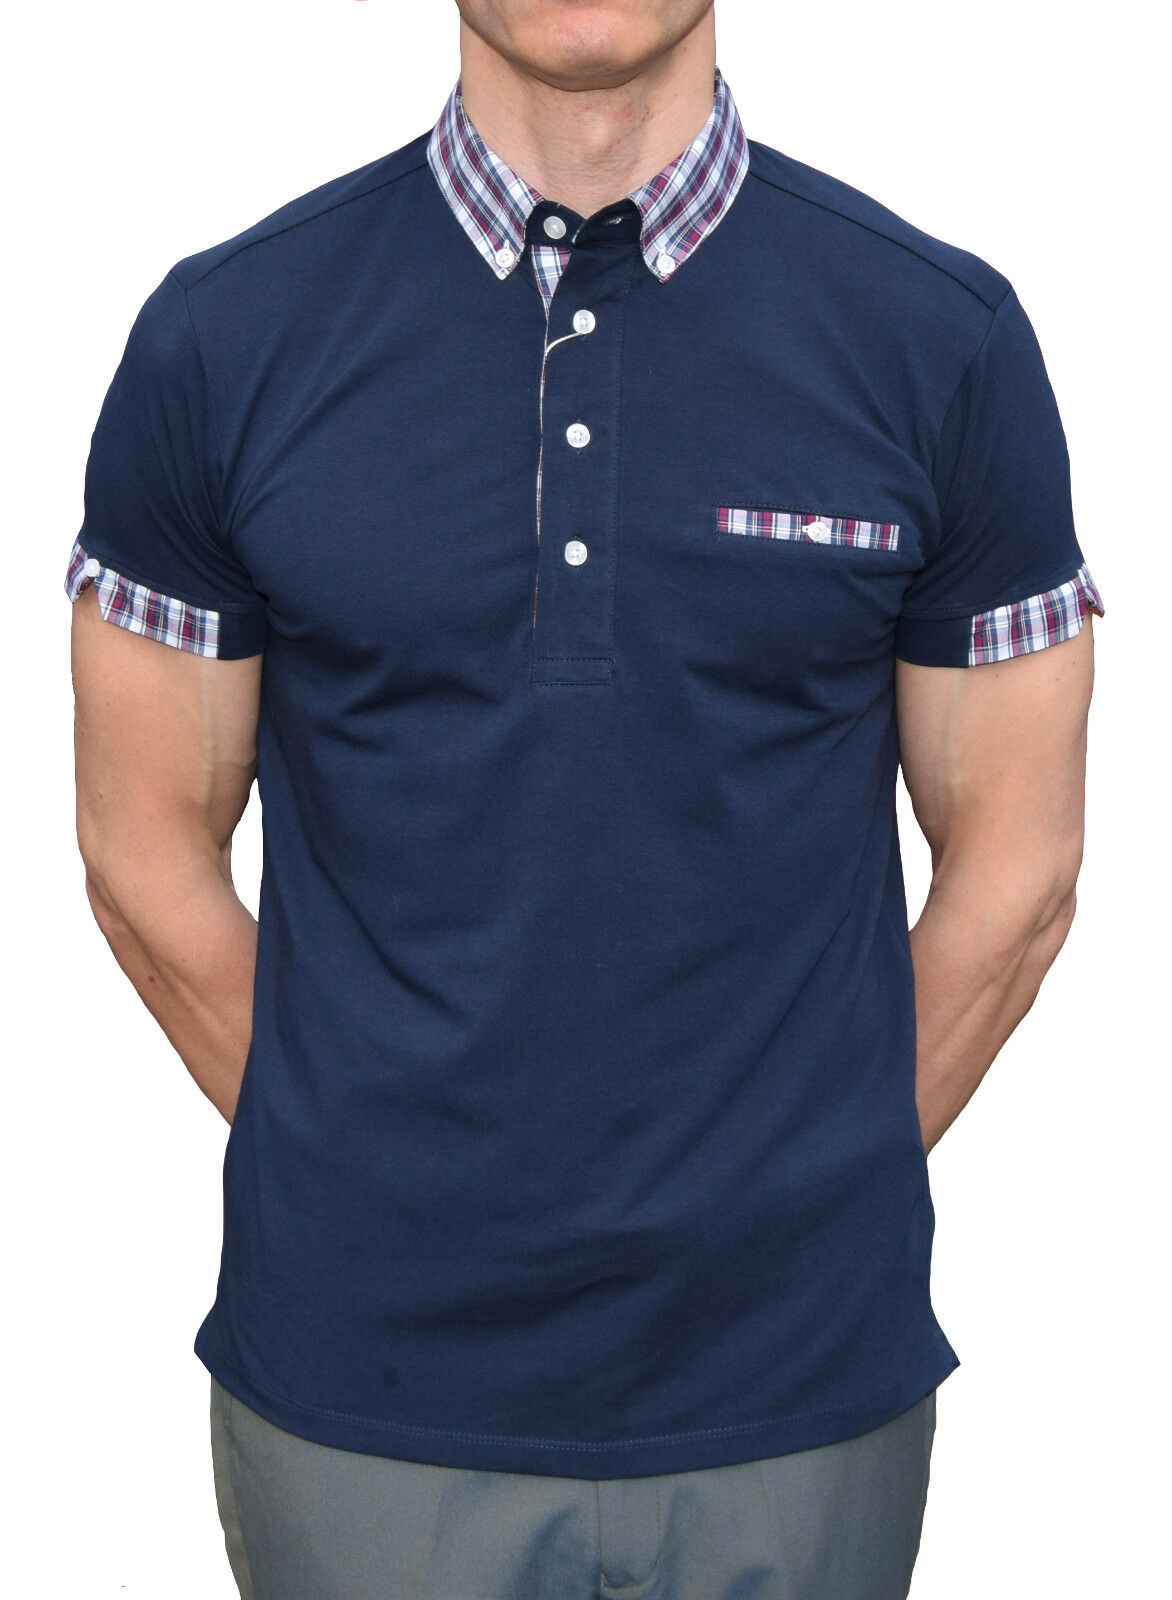 NAVY TARTAN POLO SHIRT RELCO SKINHEAD SCOOTERIST RETRO SKA 60'S MOD CLOTHING